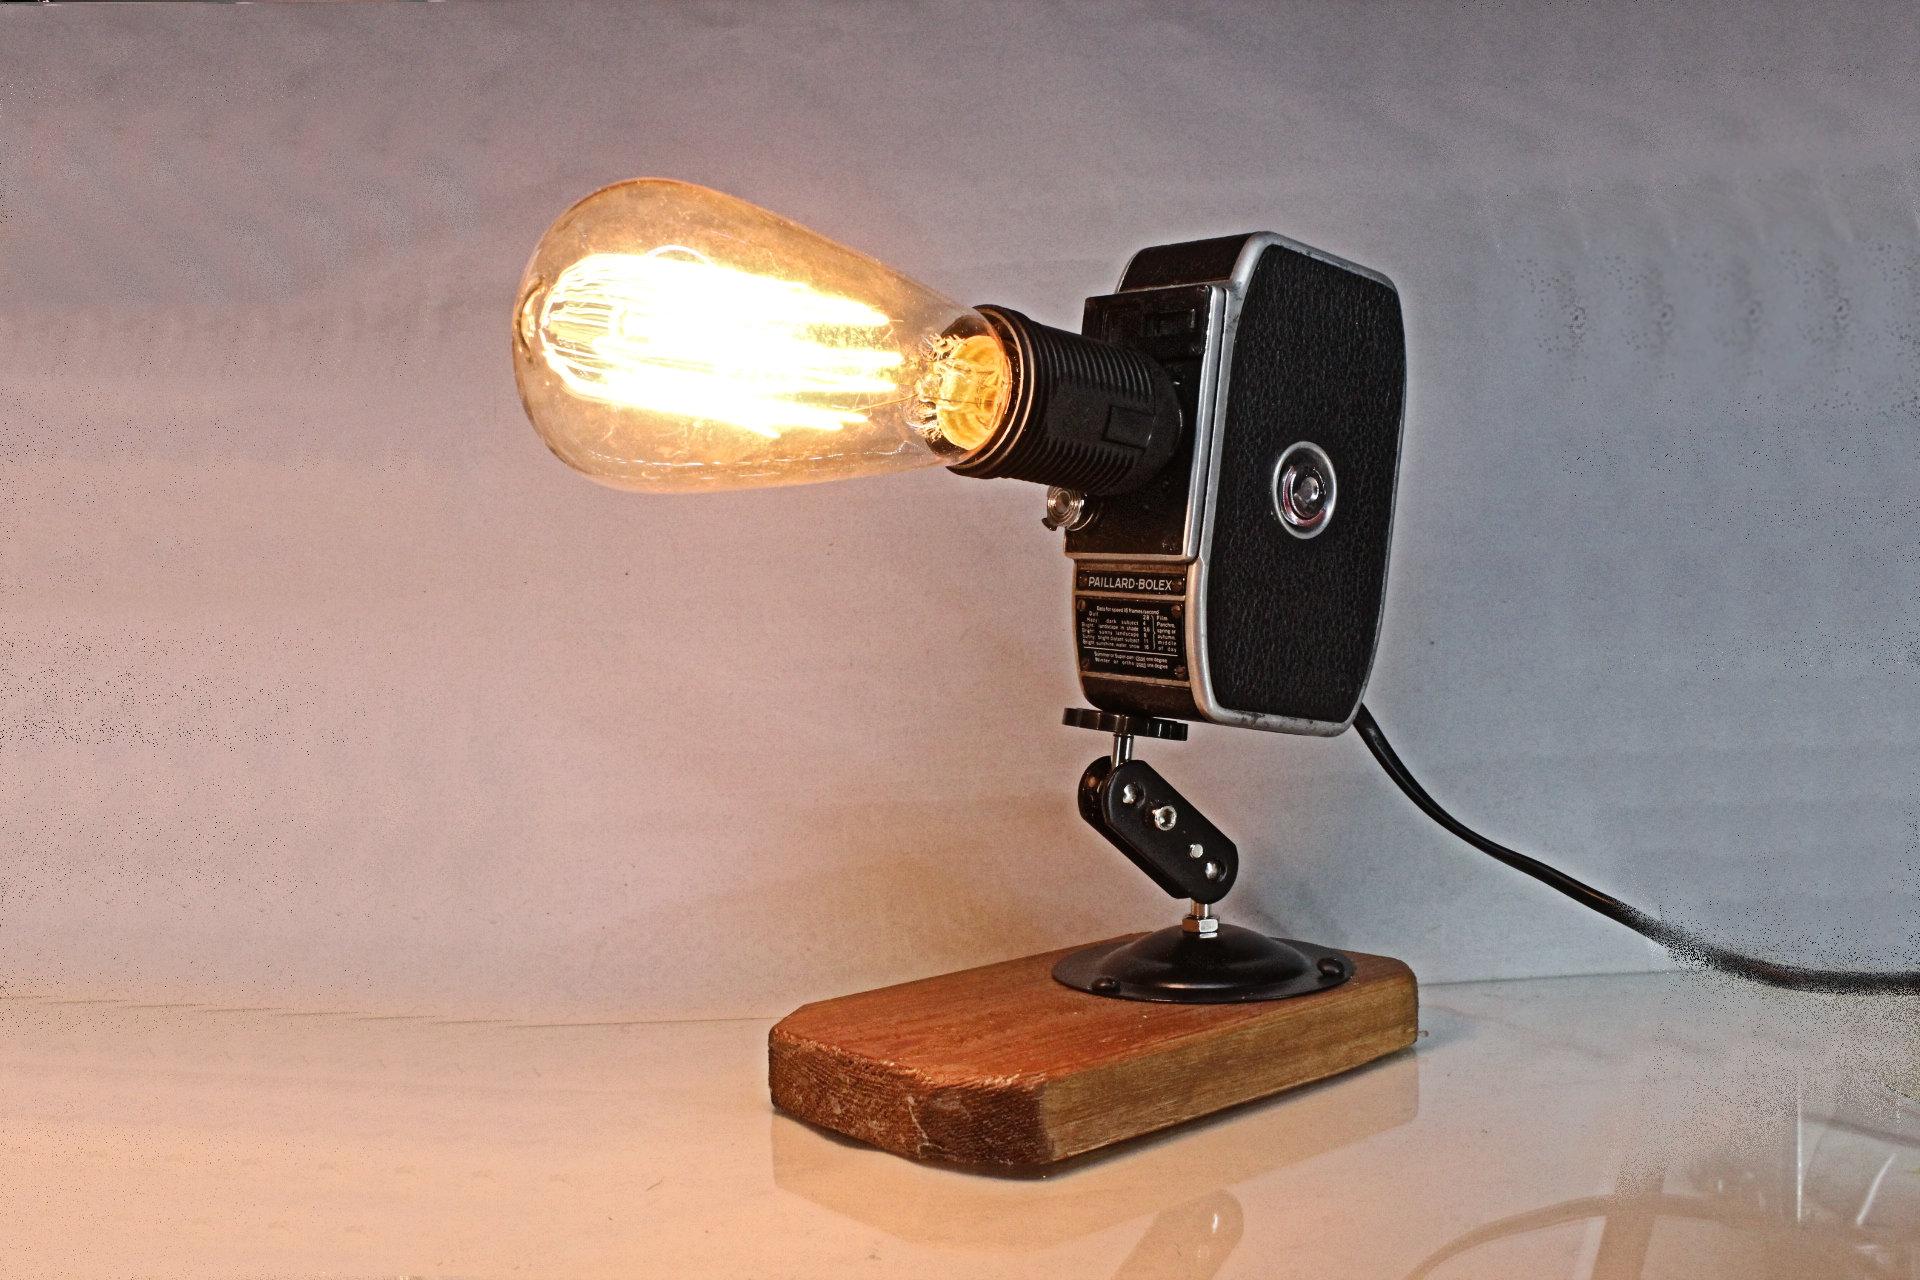 Original Vintage Bolex Movie Camera Repurposed Upcycled Desk Lamp ...